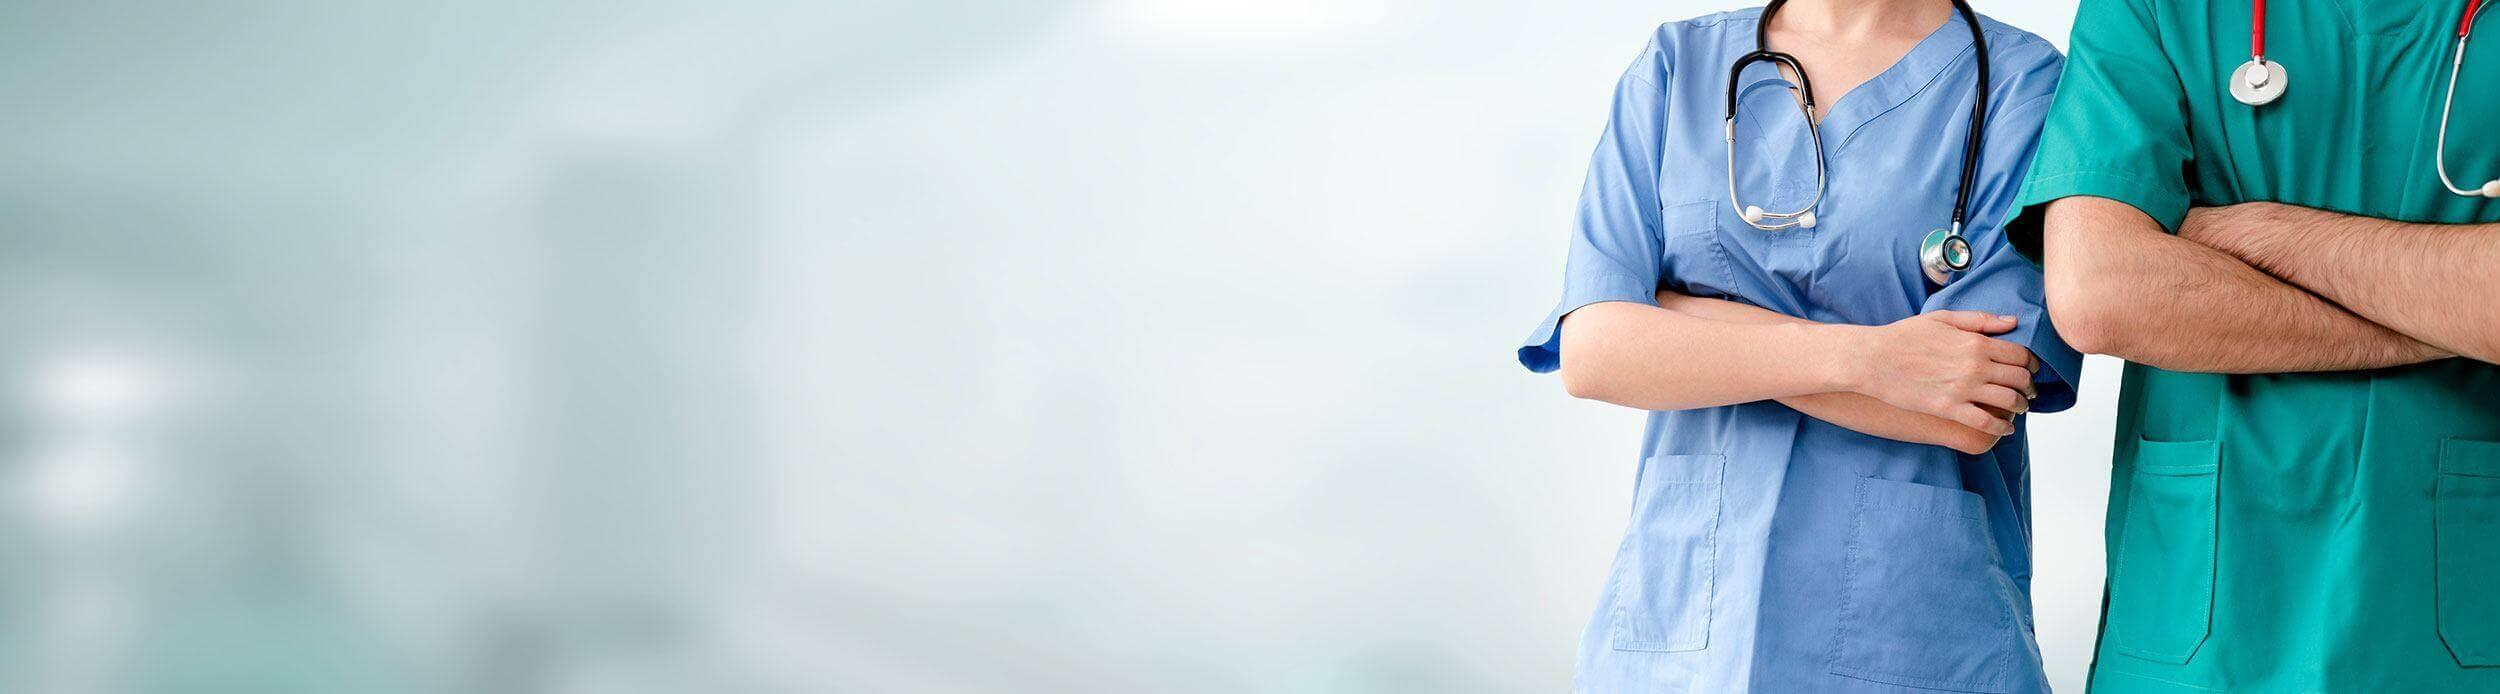 Online Acute Care Nurse Practitioner Programs: Top for 2019